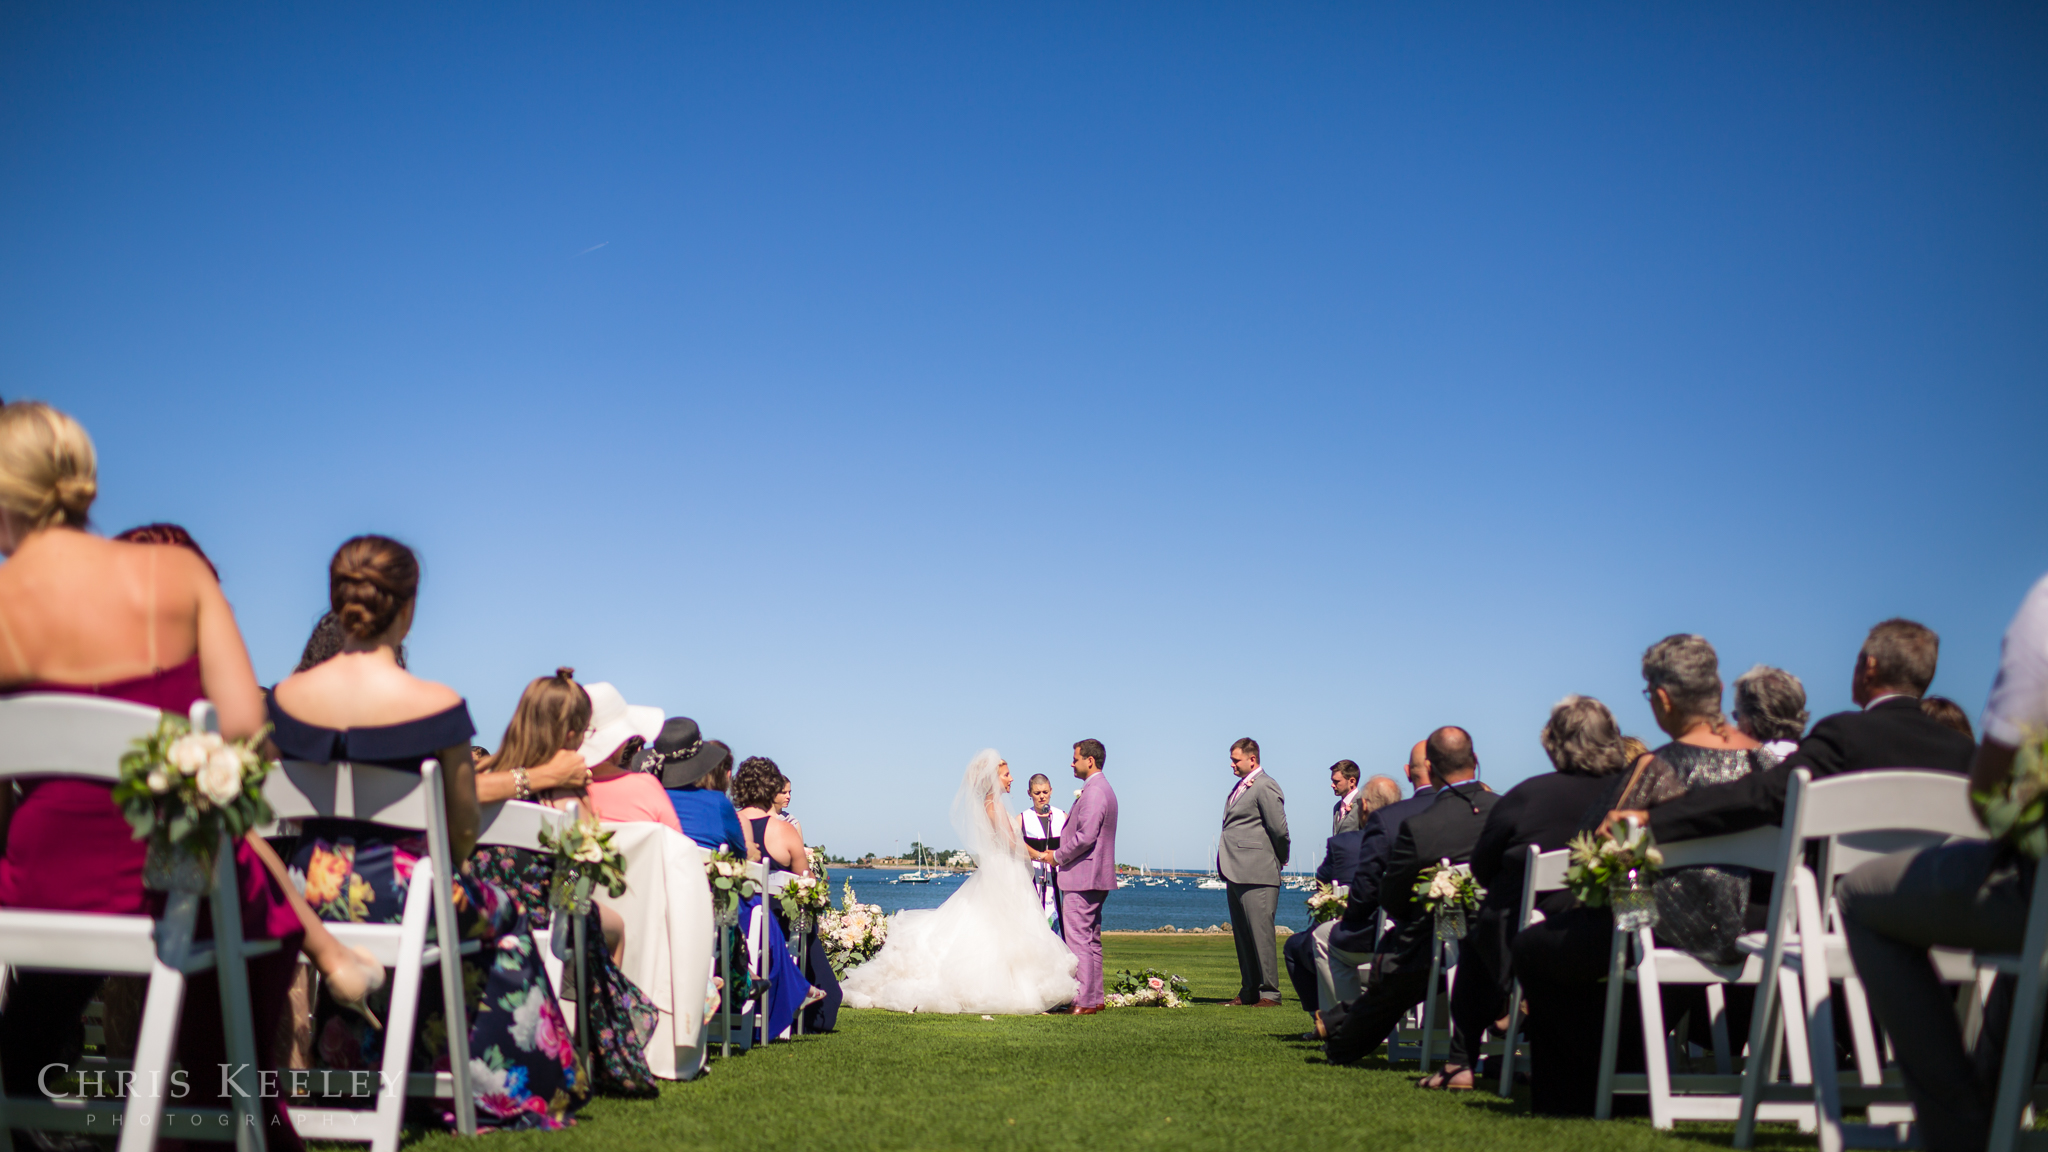 wentworth-portsmouth-new-hampshire-wedding-photographer-51.jpg